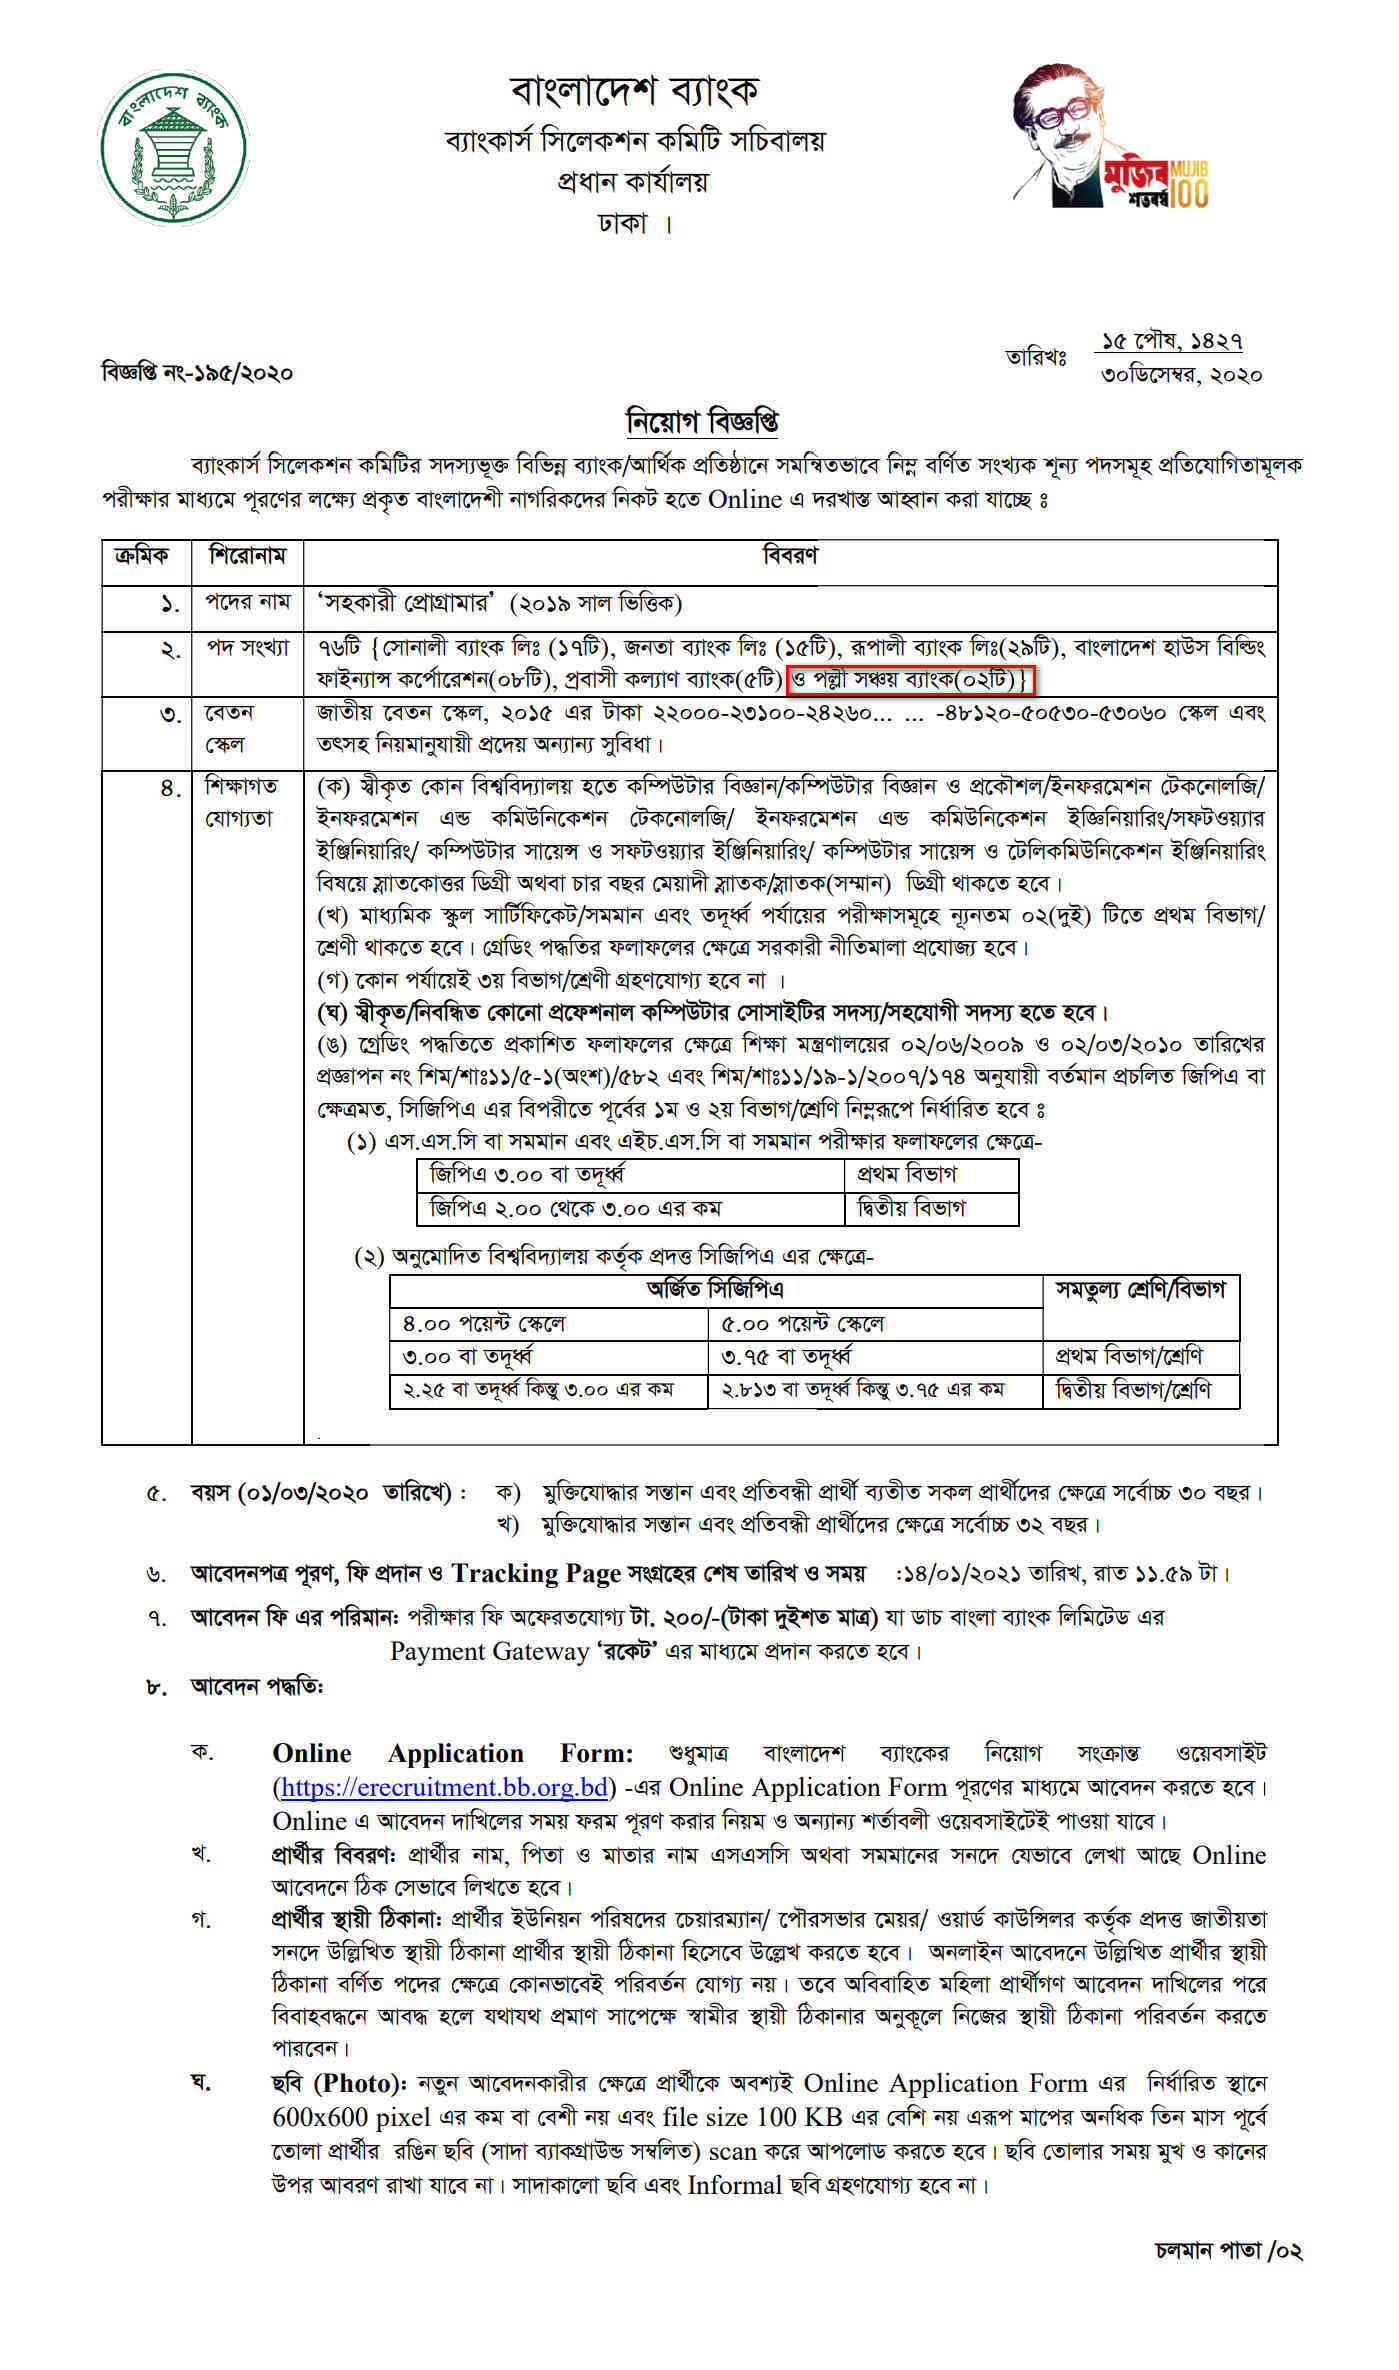 pallisanchay-bank-job-circular-learninghomebd